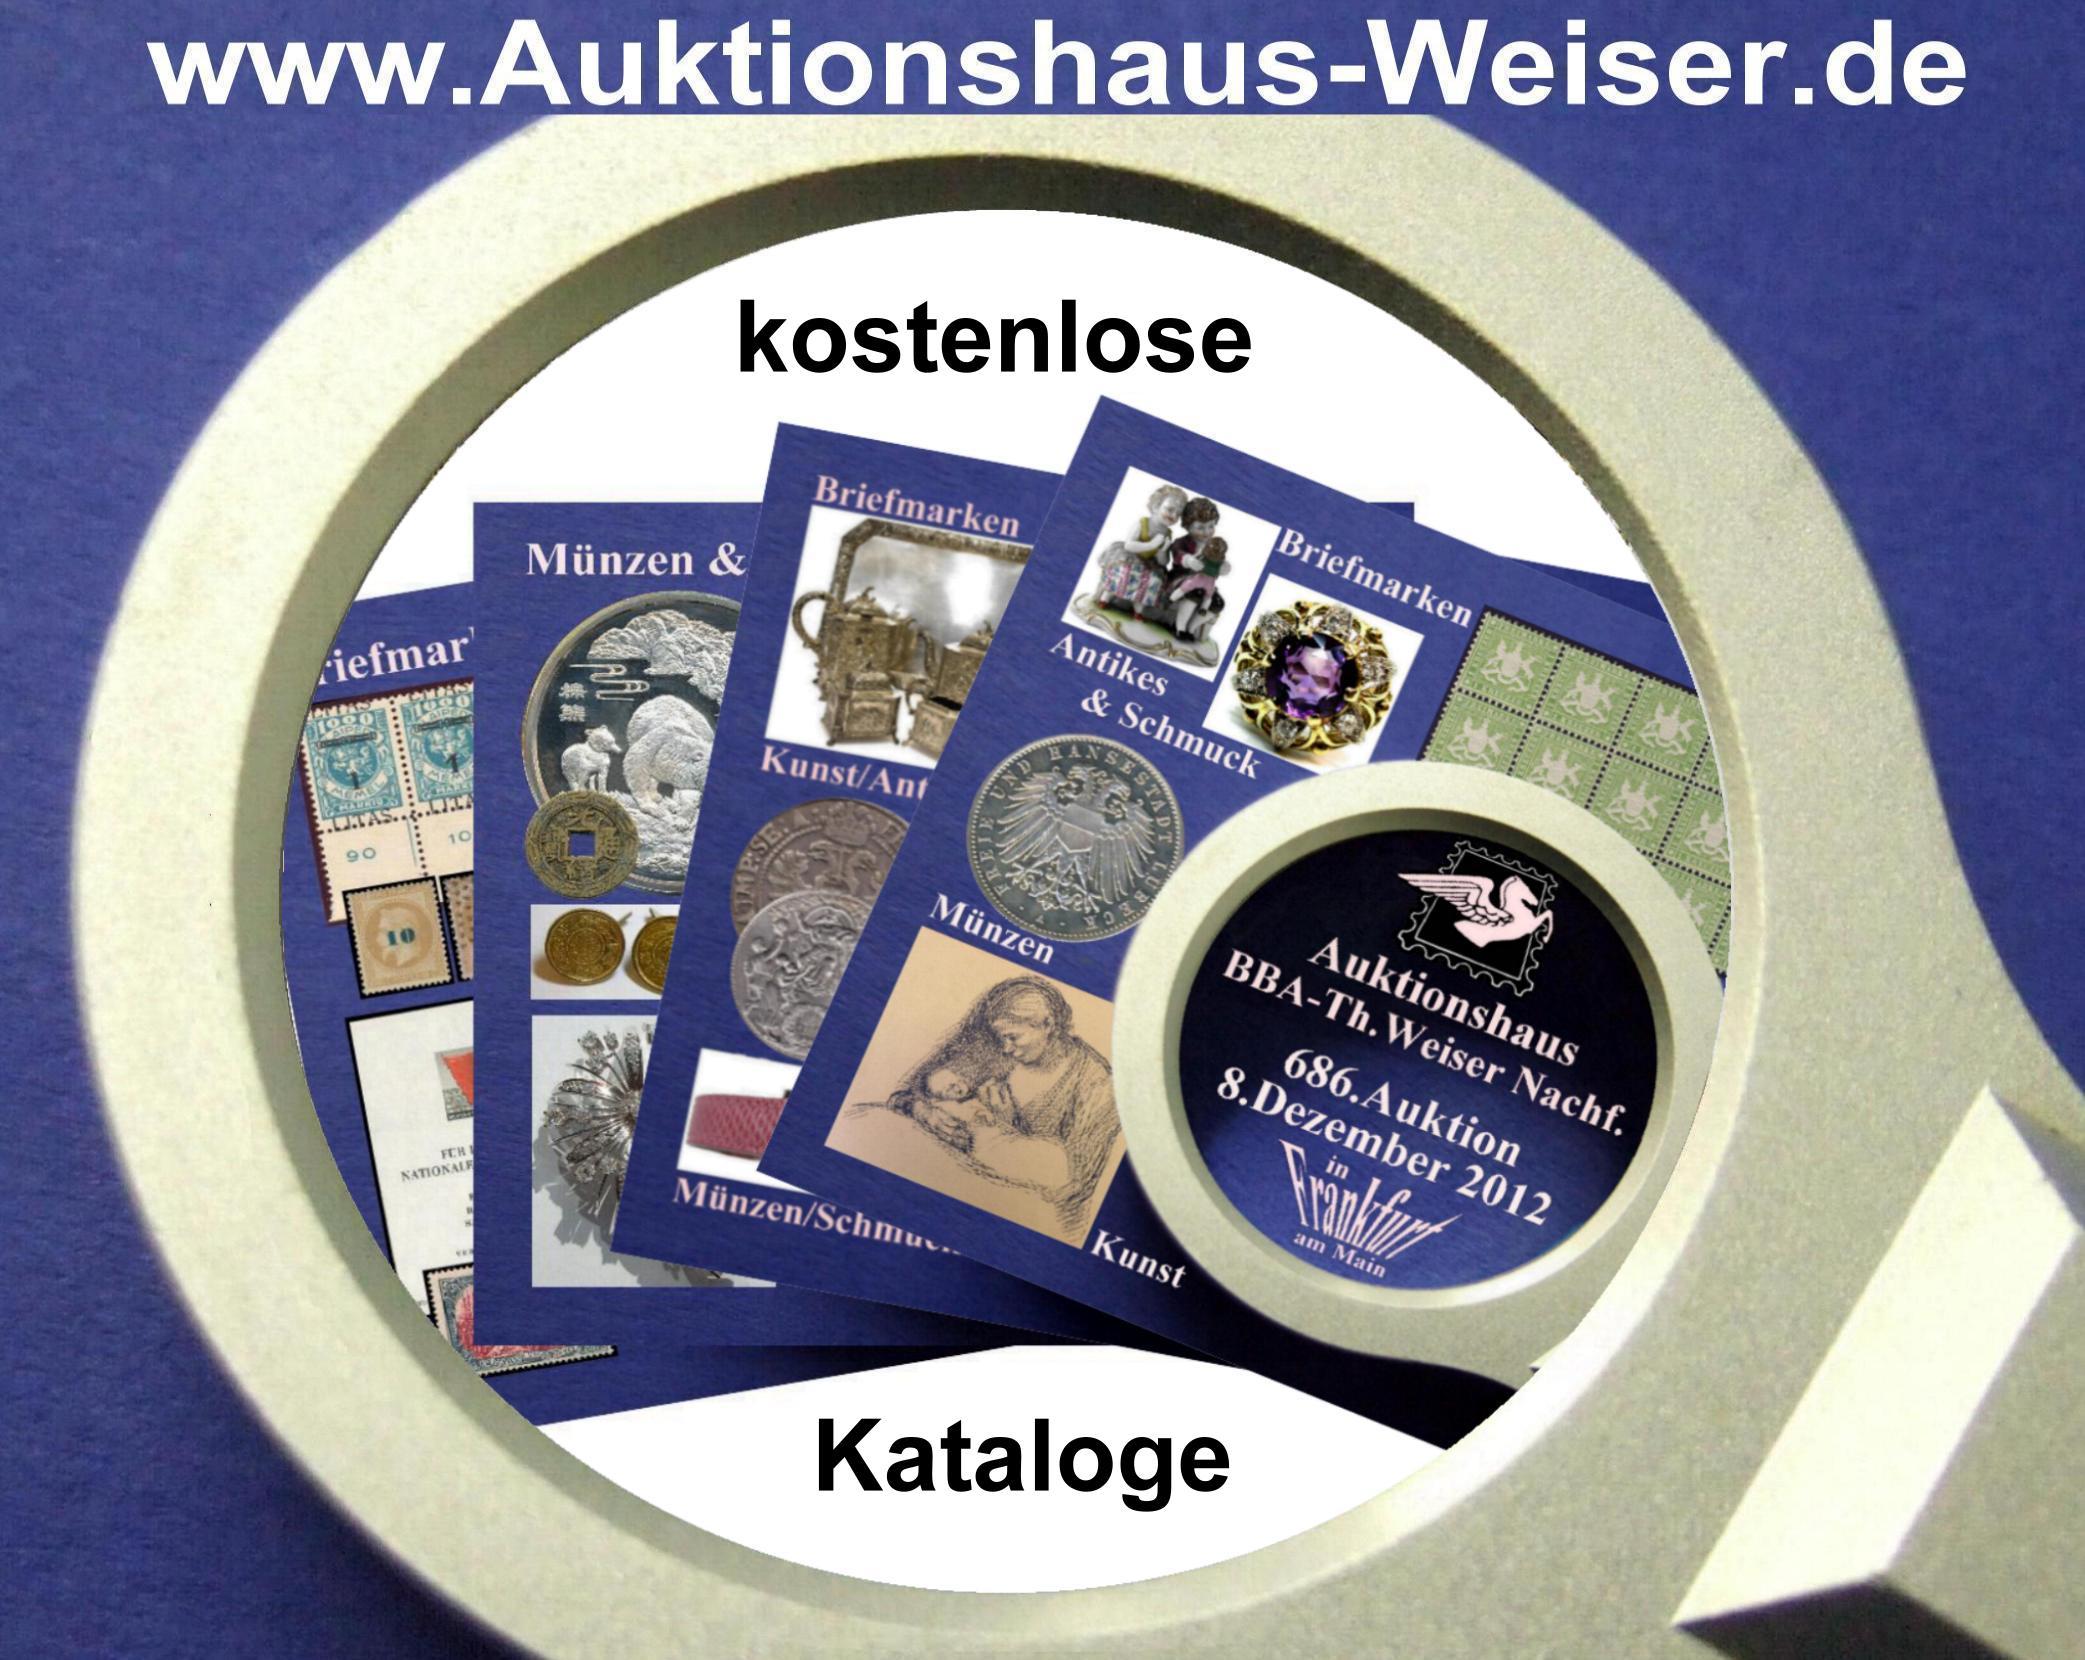 BBA -Therese Weiser Nachf. Auktionshaus & Barankauf